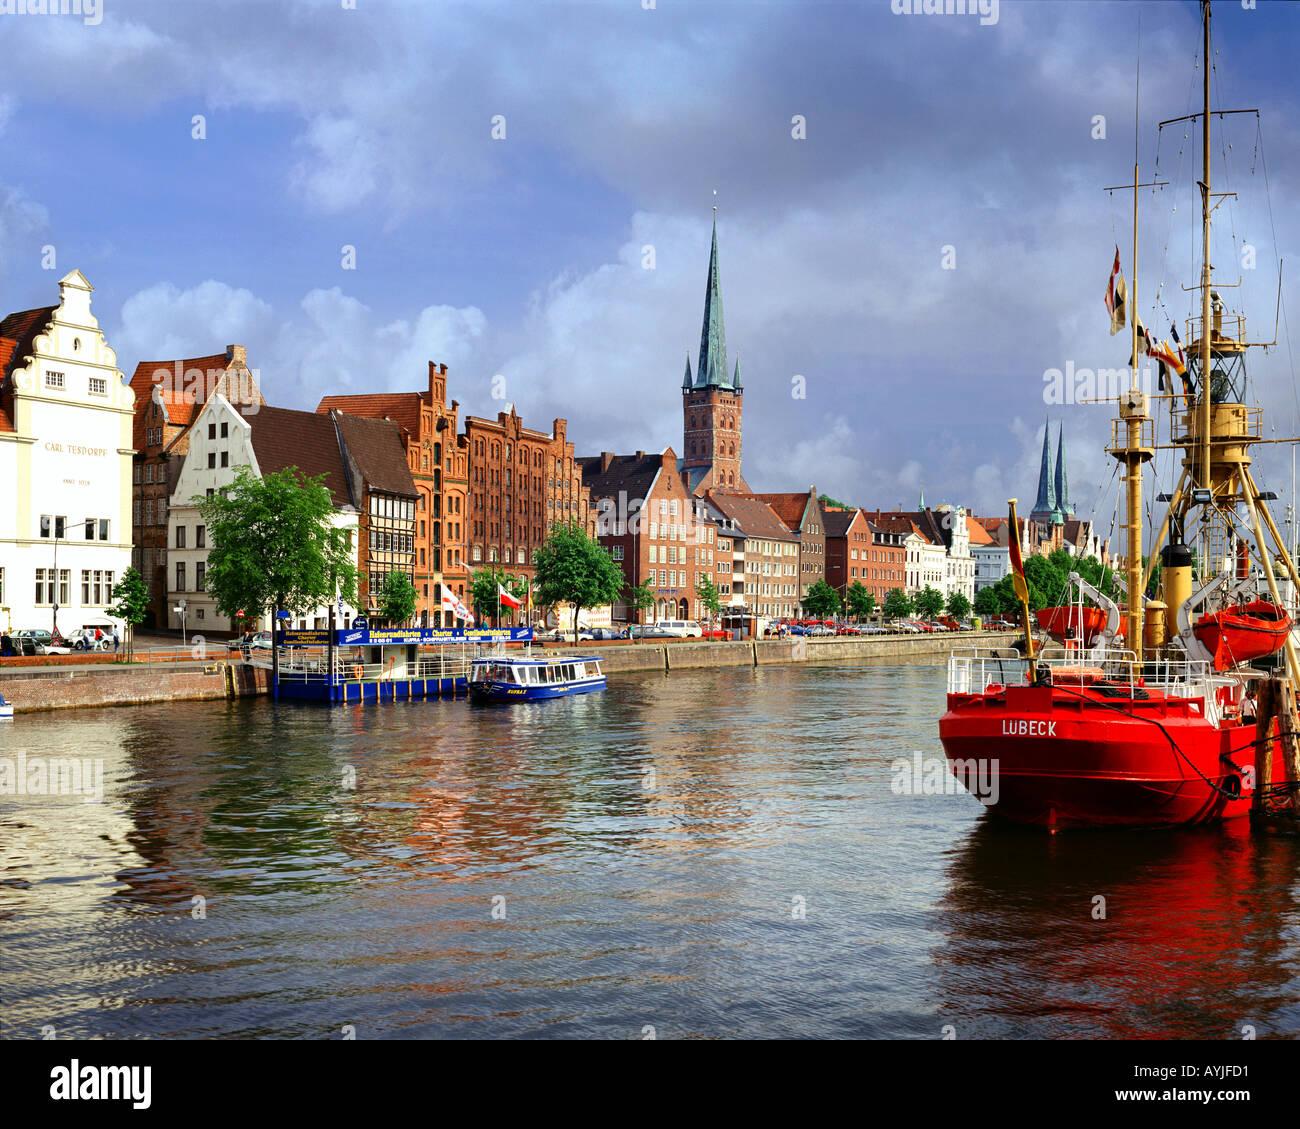 DE -  SCHLESWIG HOLSTEIN: River Trave and Hansestadt Lübeck Stock Photo